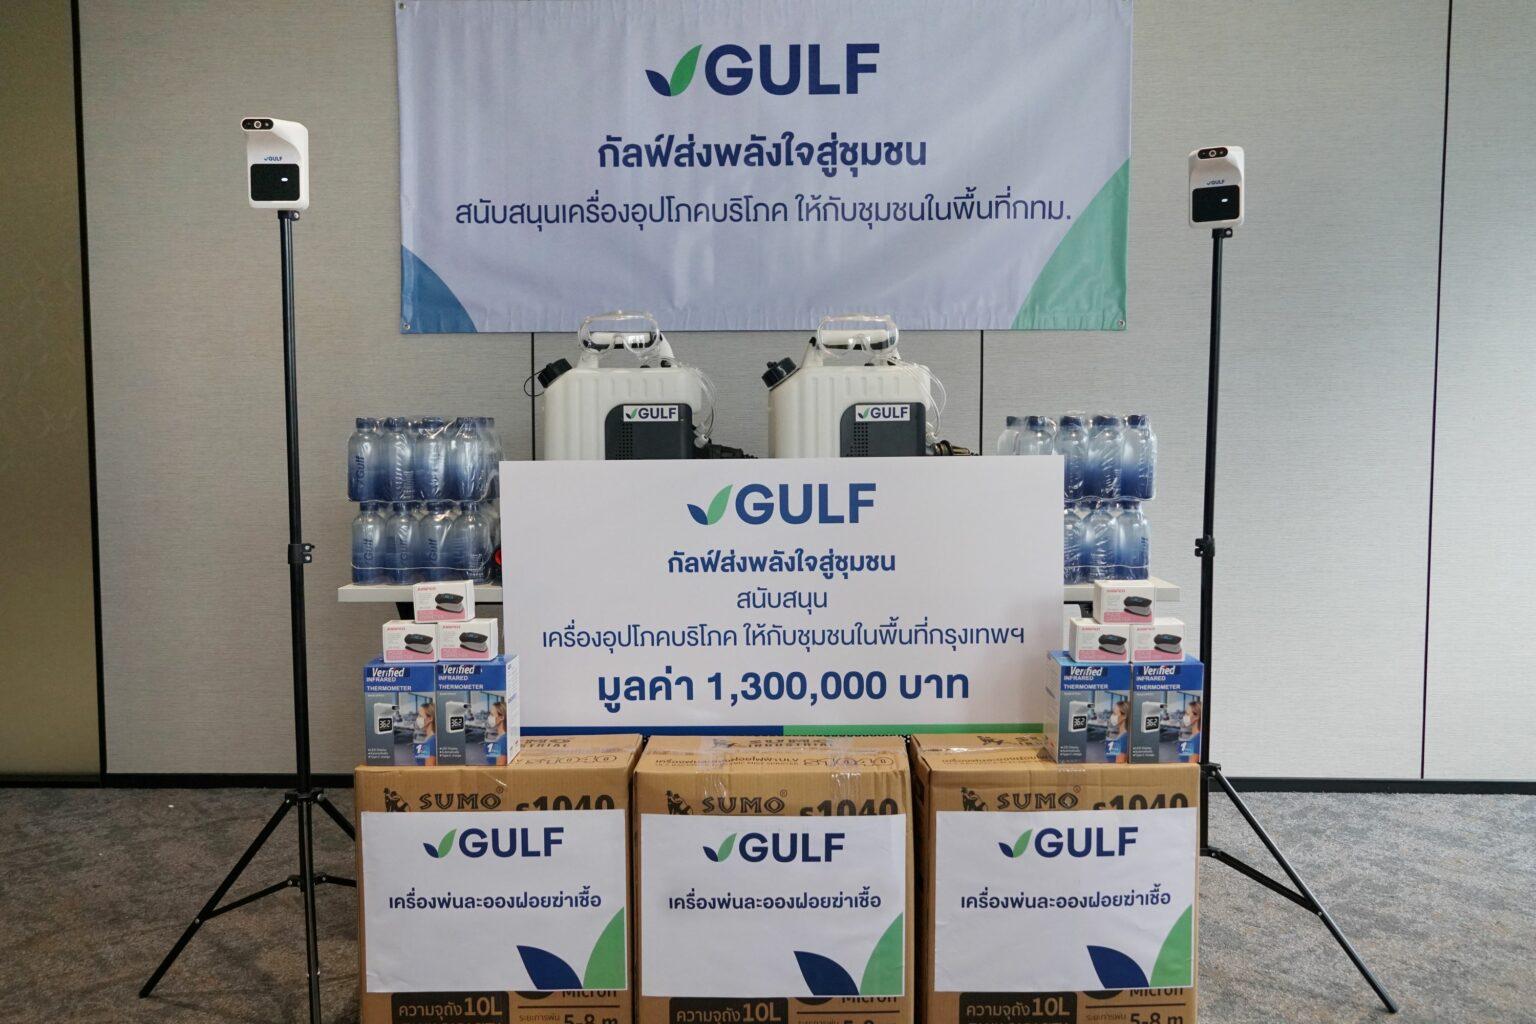 GULF Donation to Communities 1